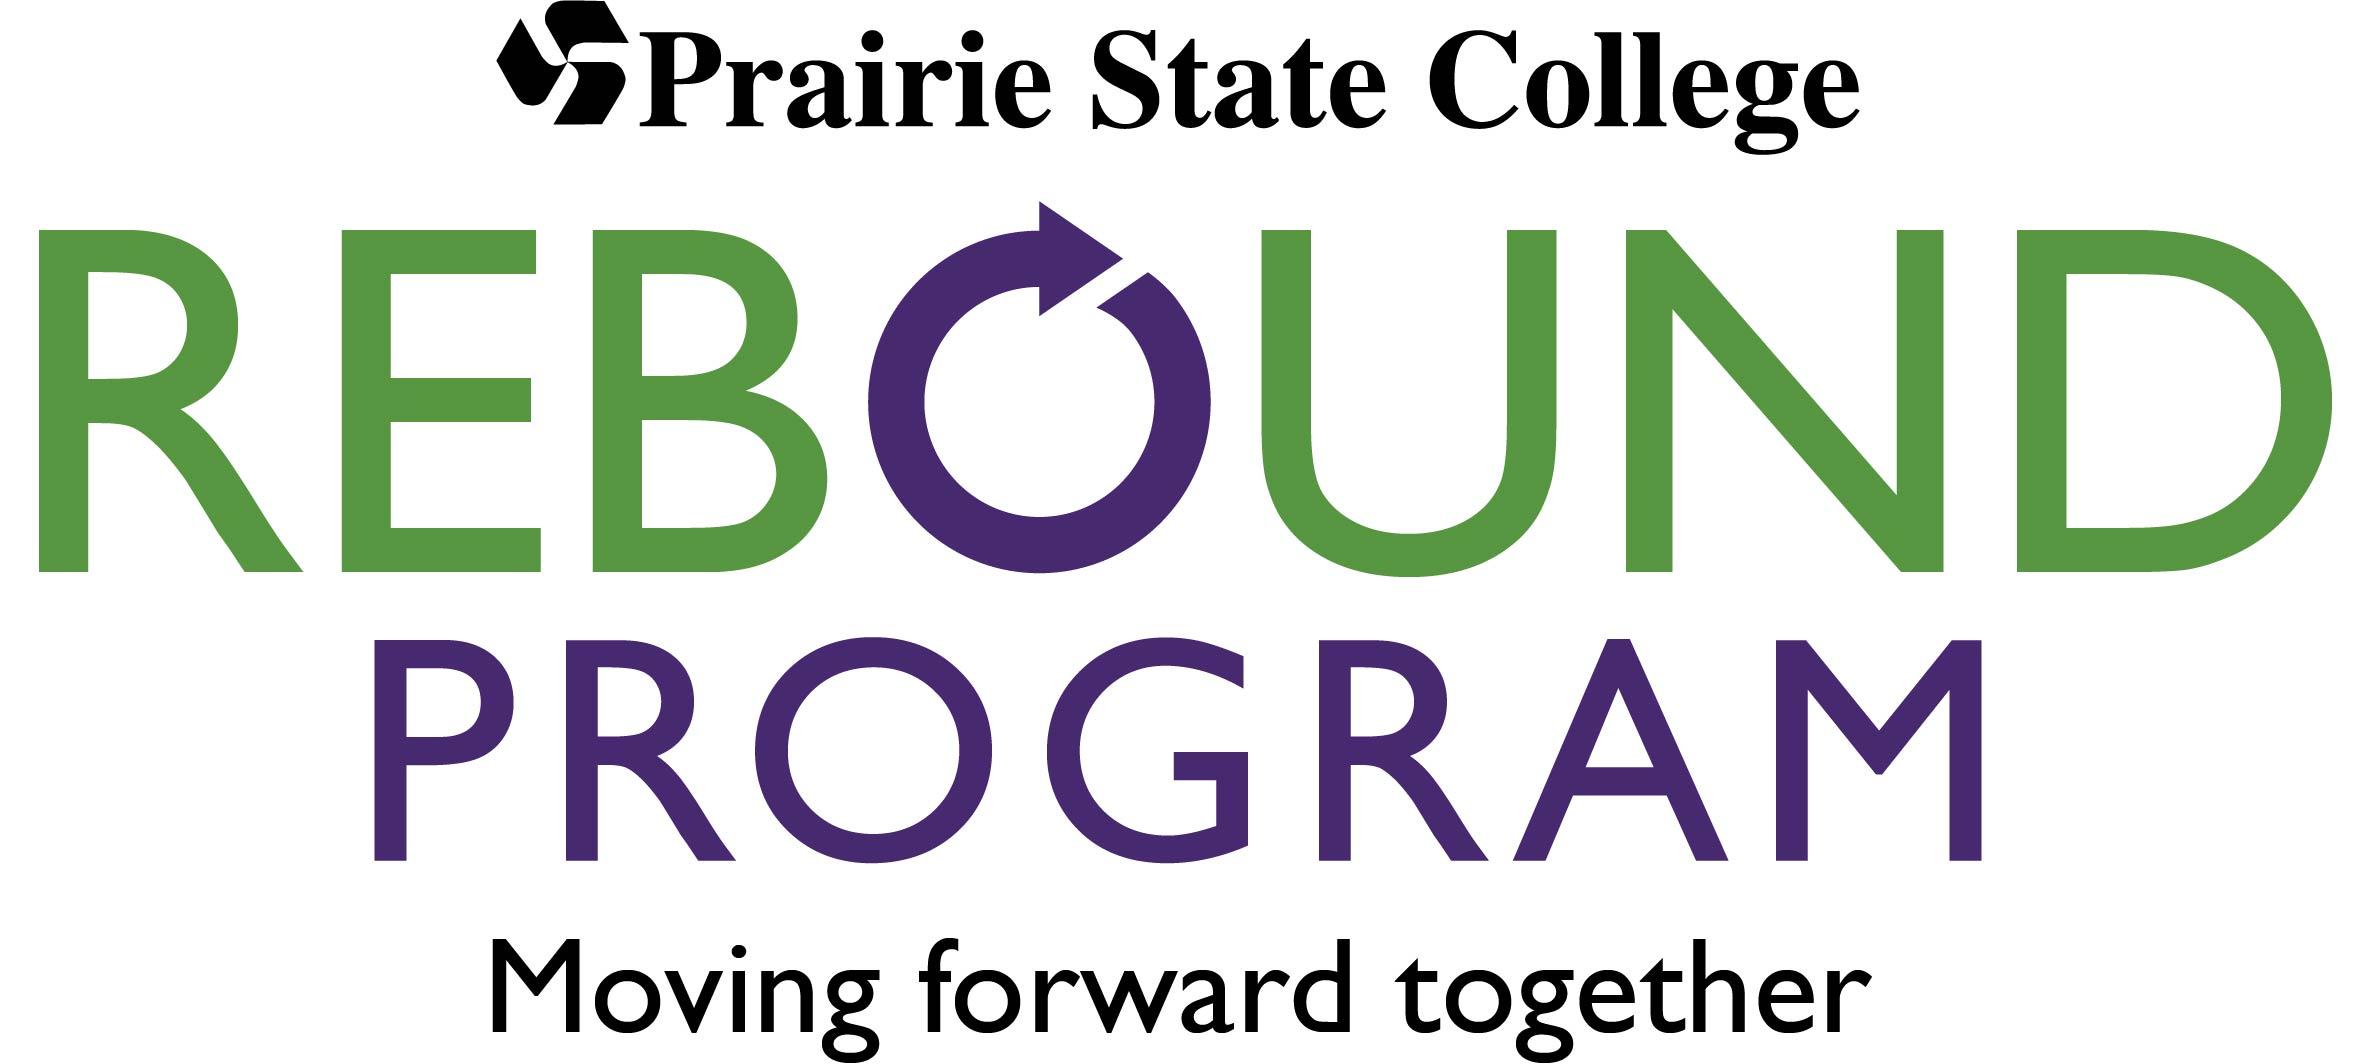 Prairie State College Rebound Program: Moving forward together